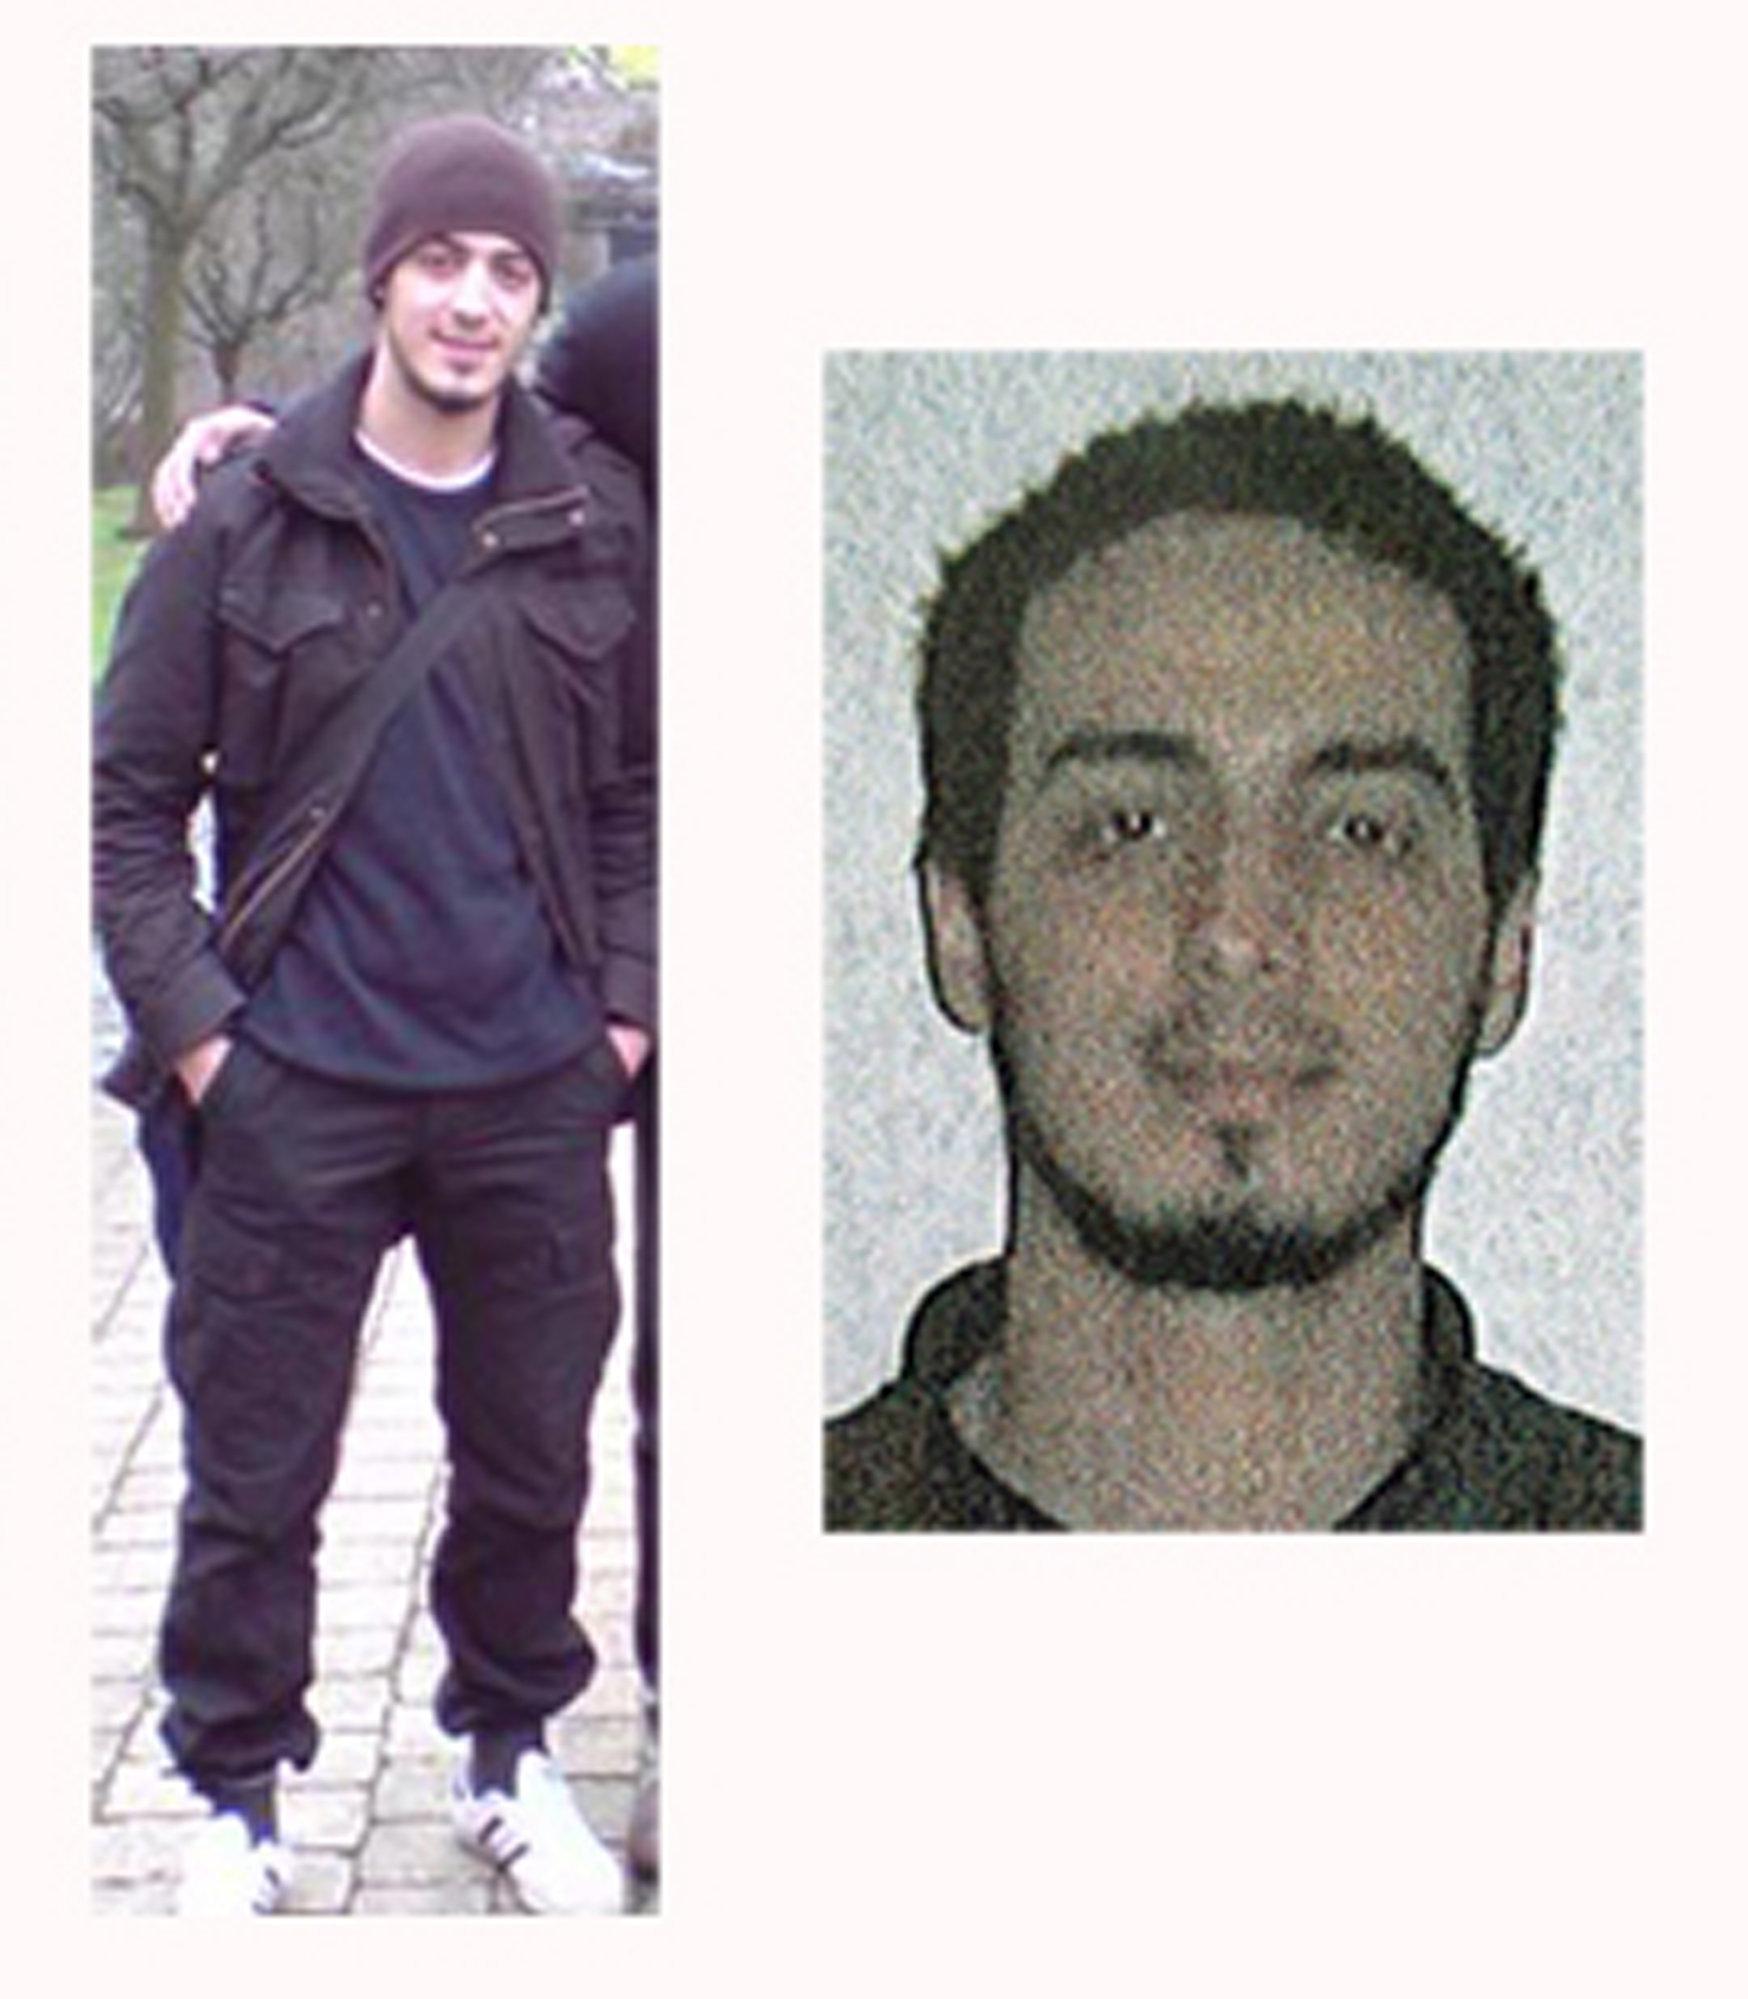 Najim Laachraoui, segundo terrorista suicida en el aeropuerto de Bruselas